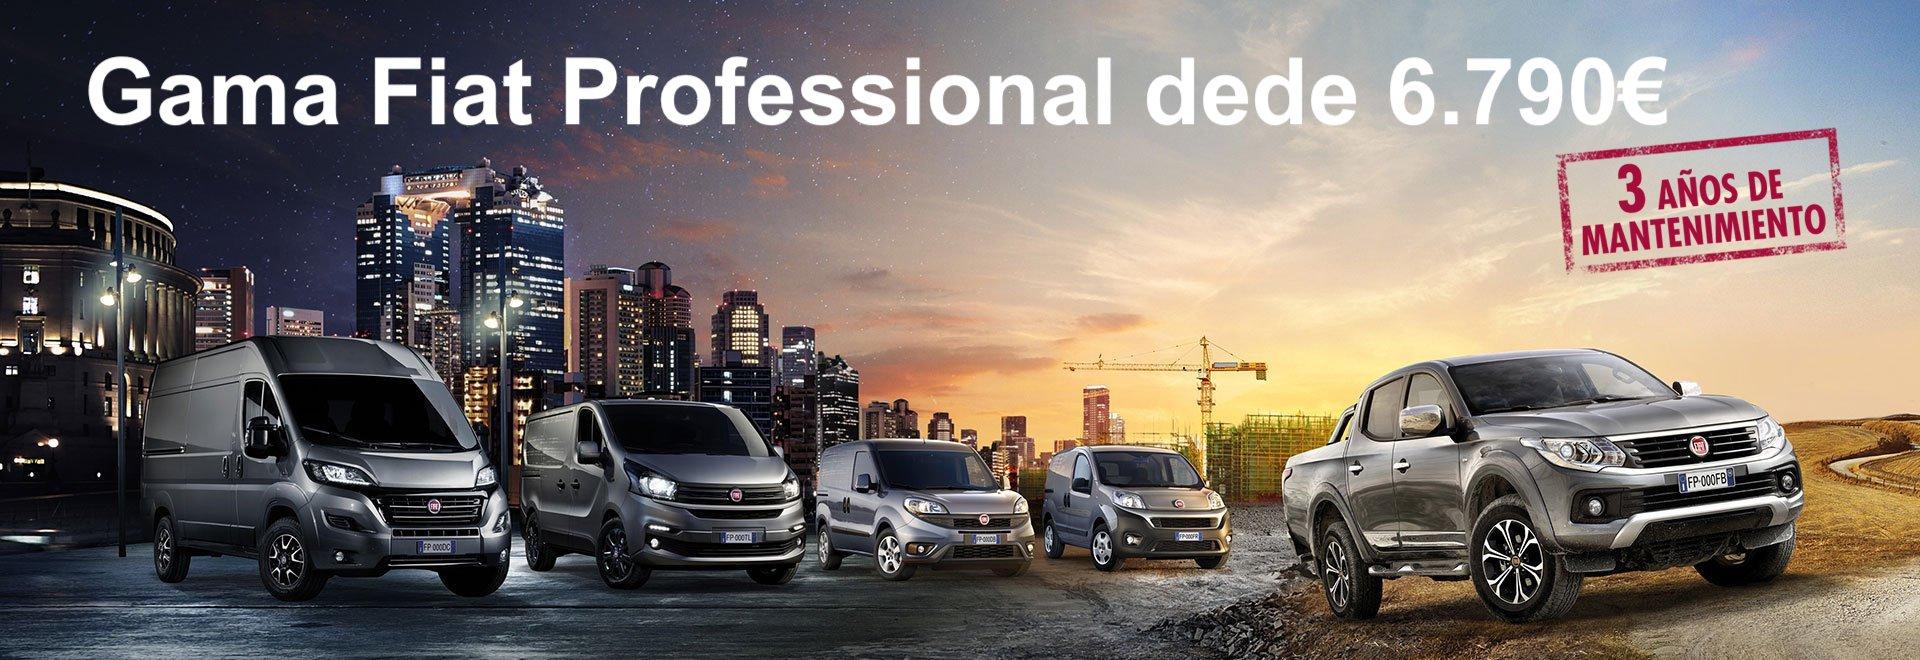 Gama Fiat Professional